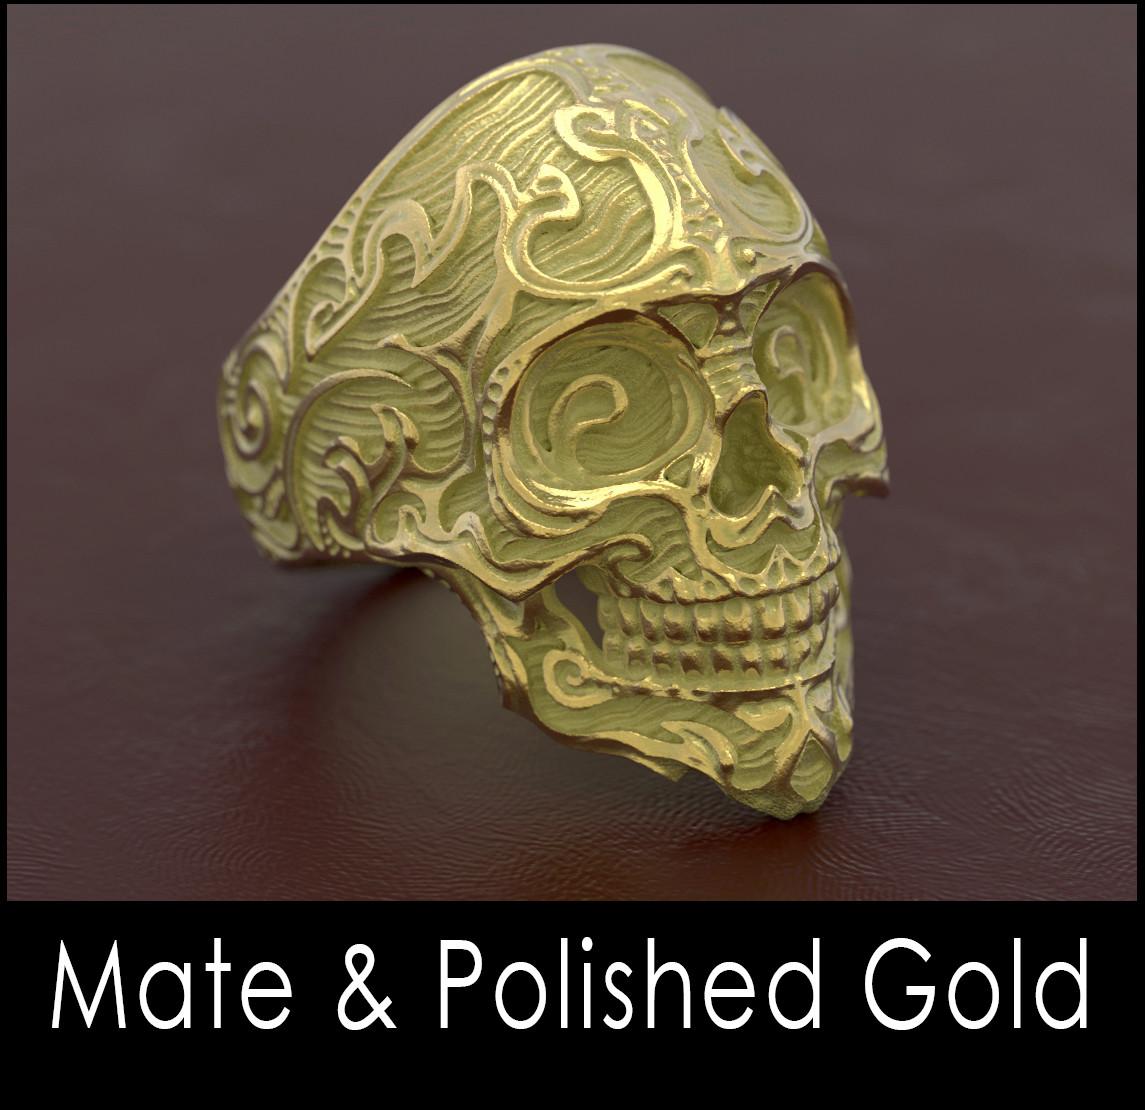 Nacho riesco gostanza mate polished gold